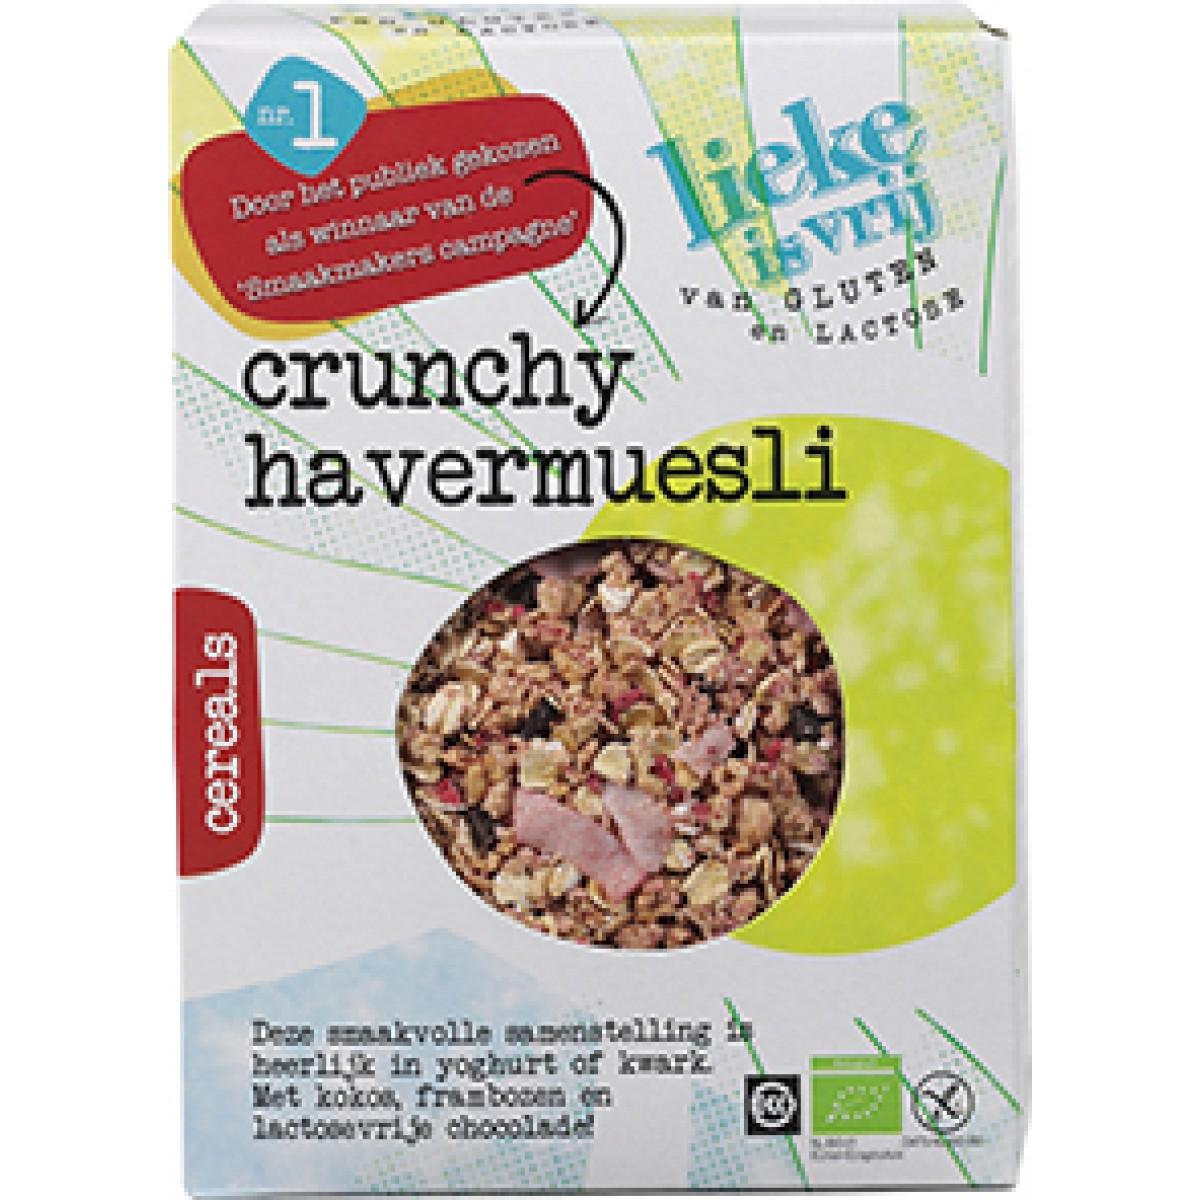 Crunchy Havermuesli